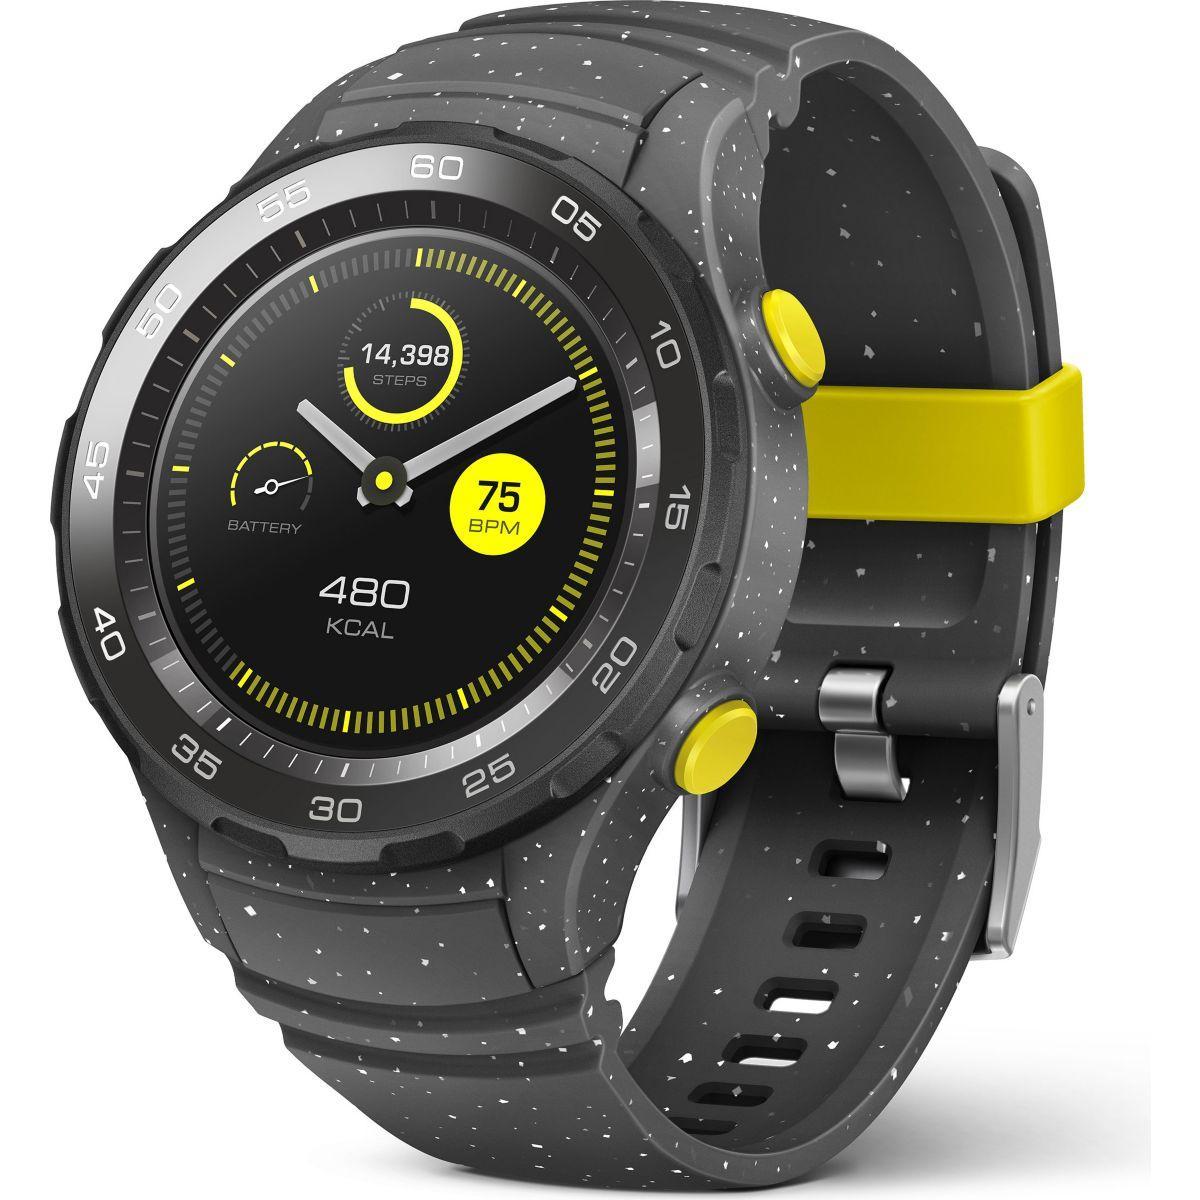 Montre connect�e huawei watch 2 sport gris - livraison offerte : code relay